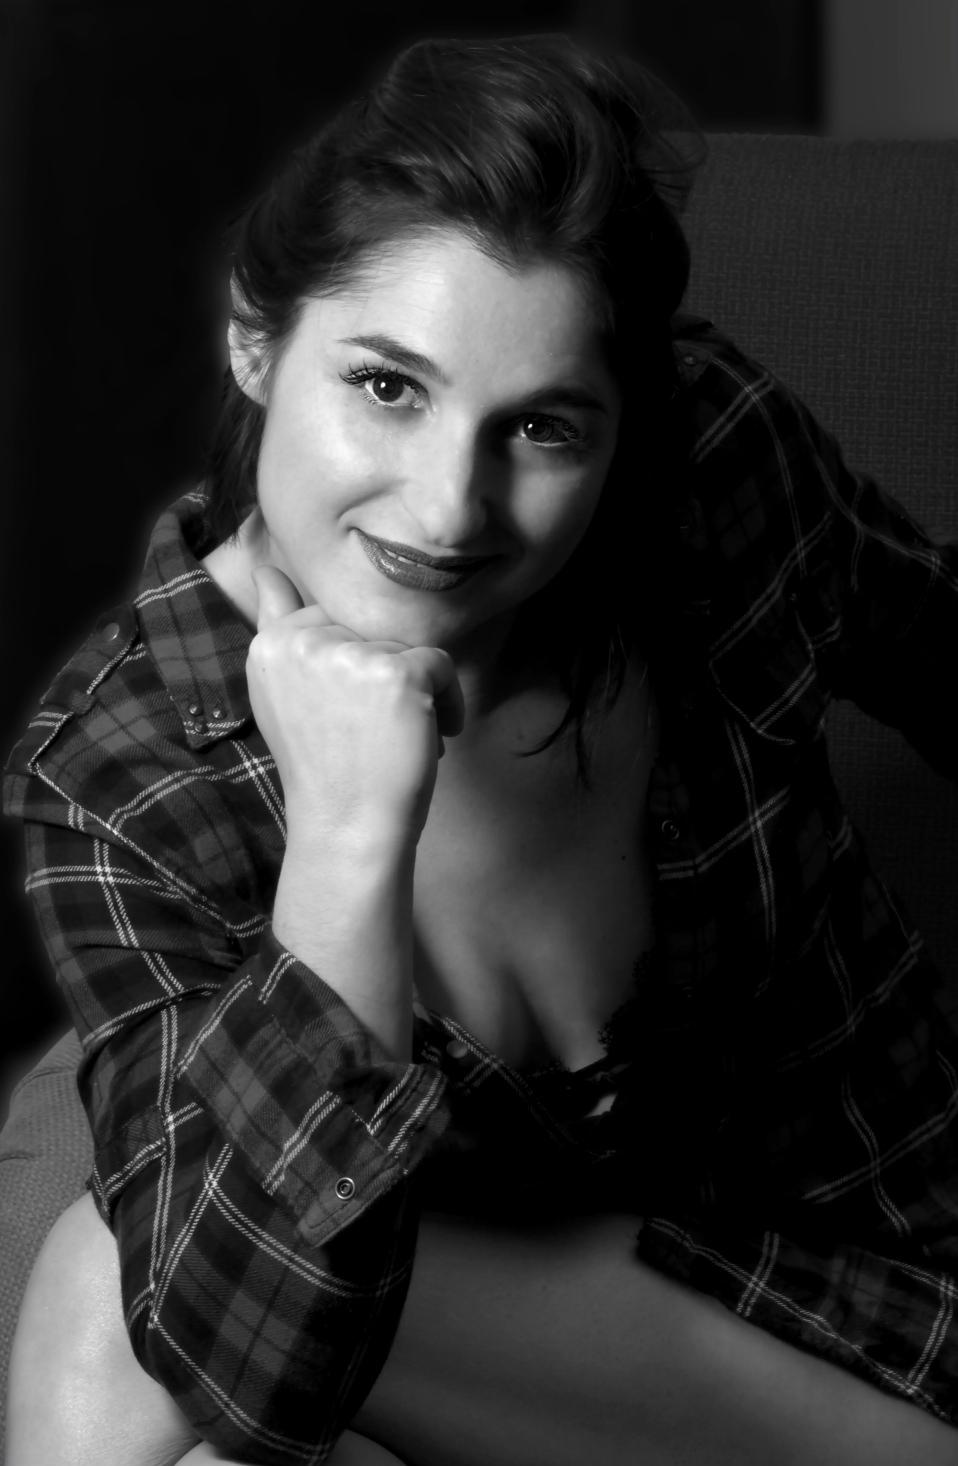 Sarah Lazerges